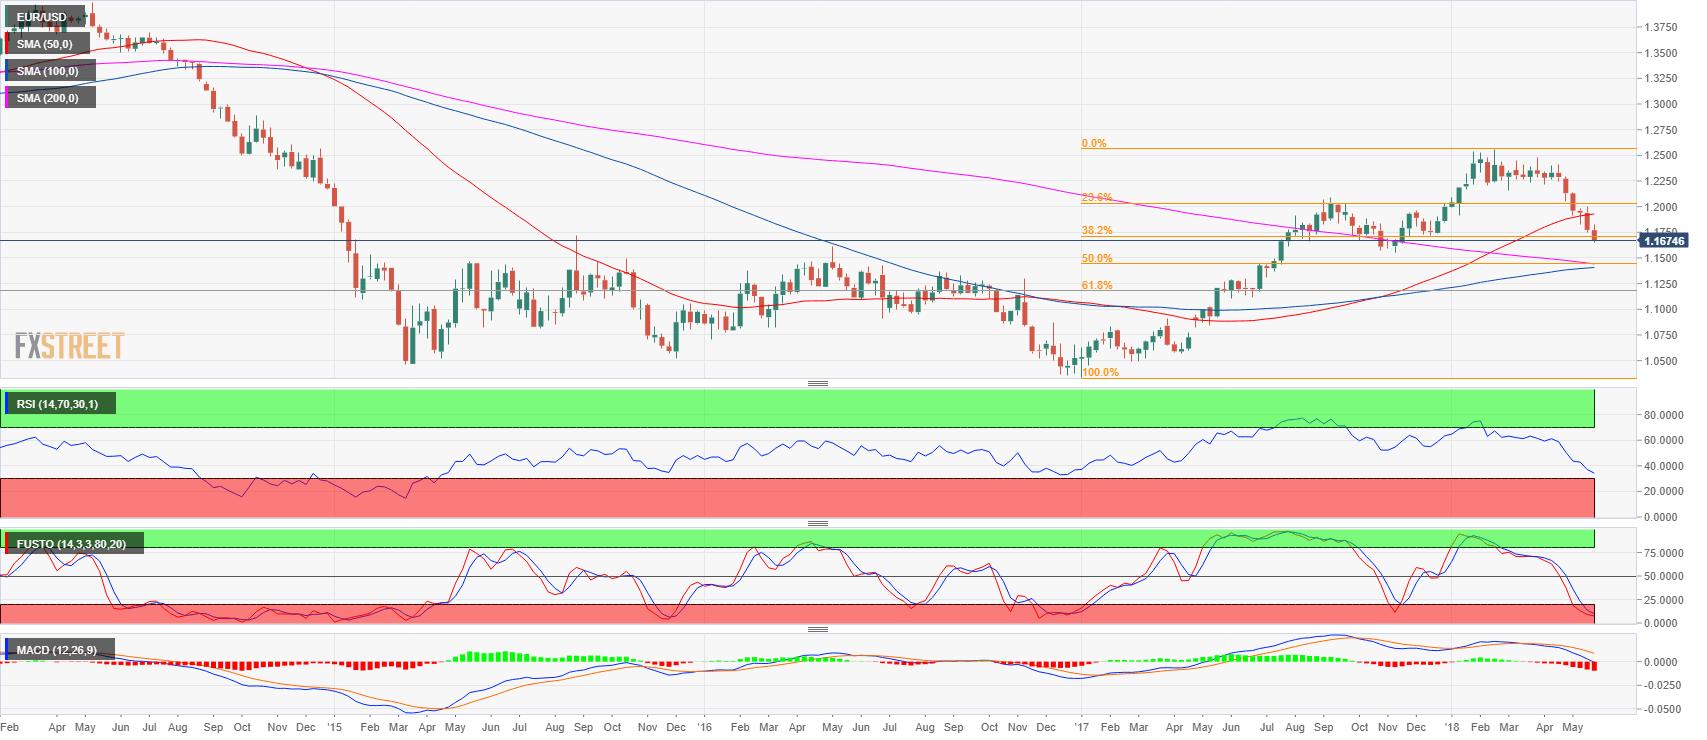 EUR/USD Technical Analysis: bearish trend remains intact